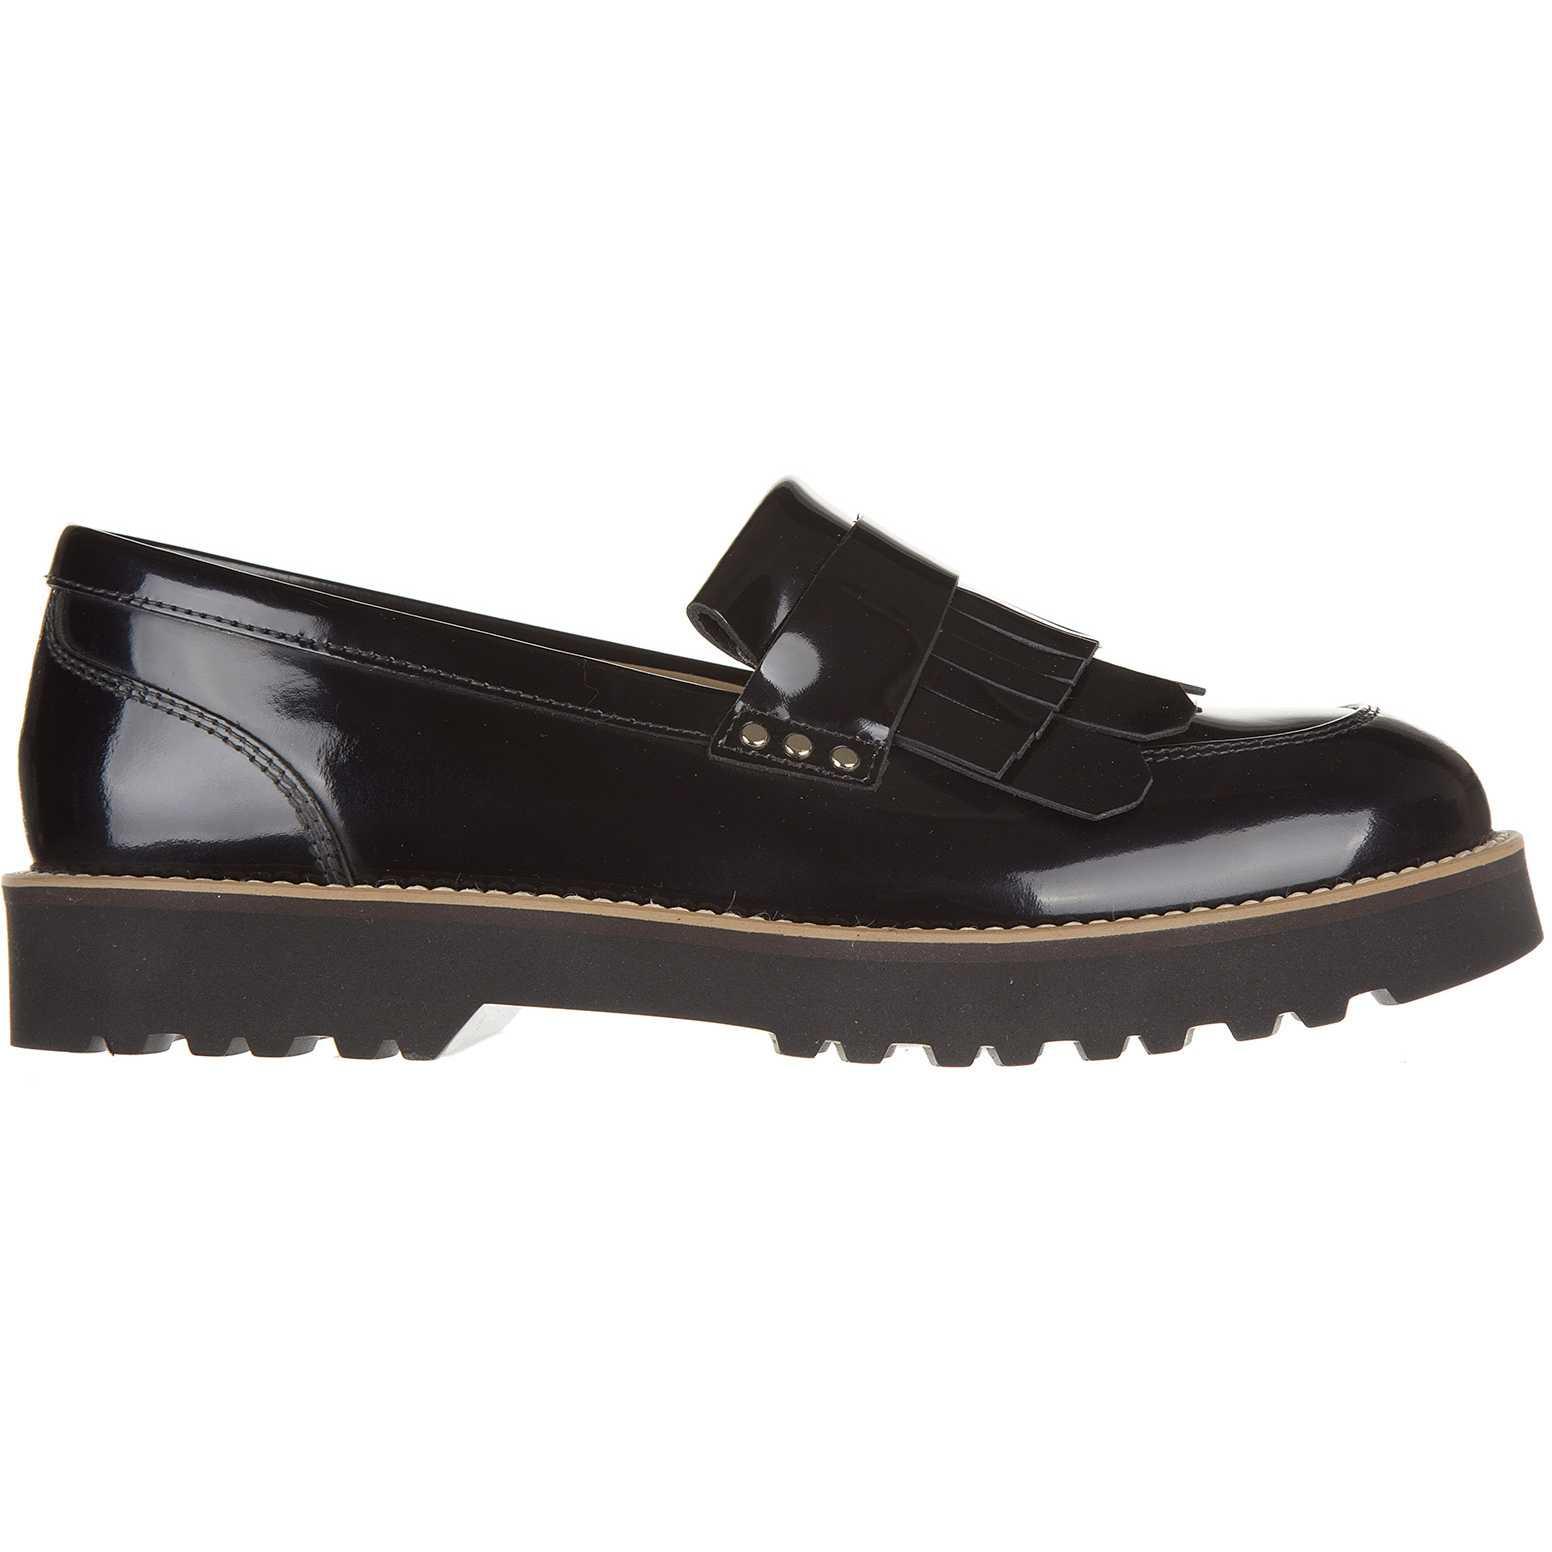 Mocasini dama Hogan Women's Leather Loafers Moccasins New H259 Route Black